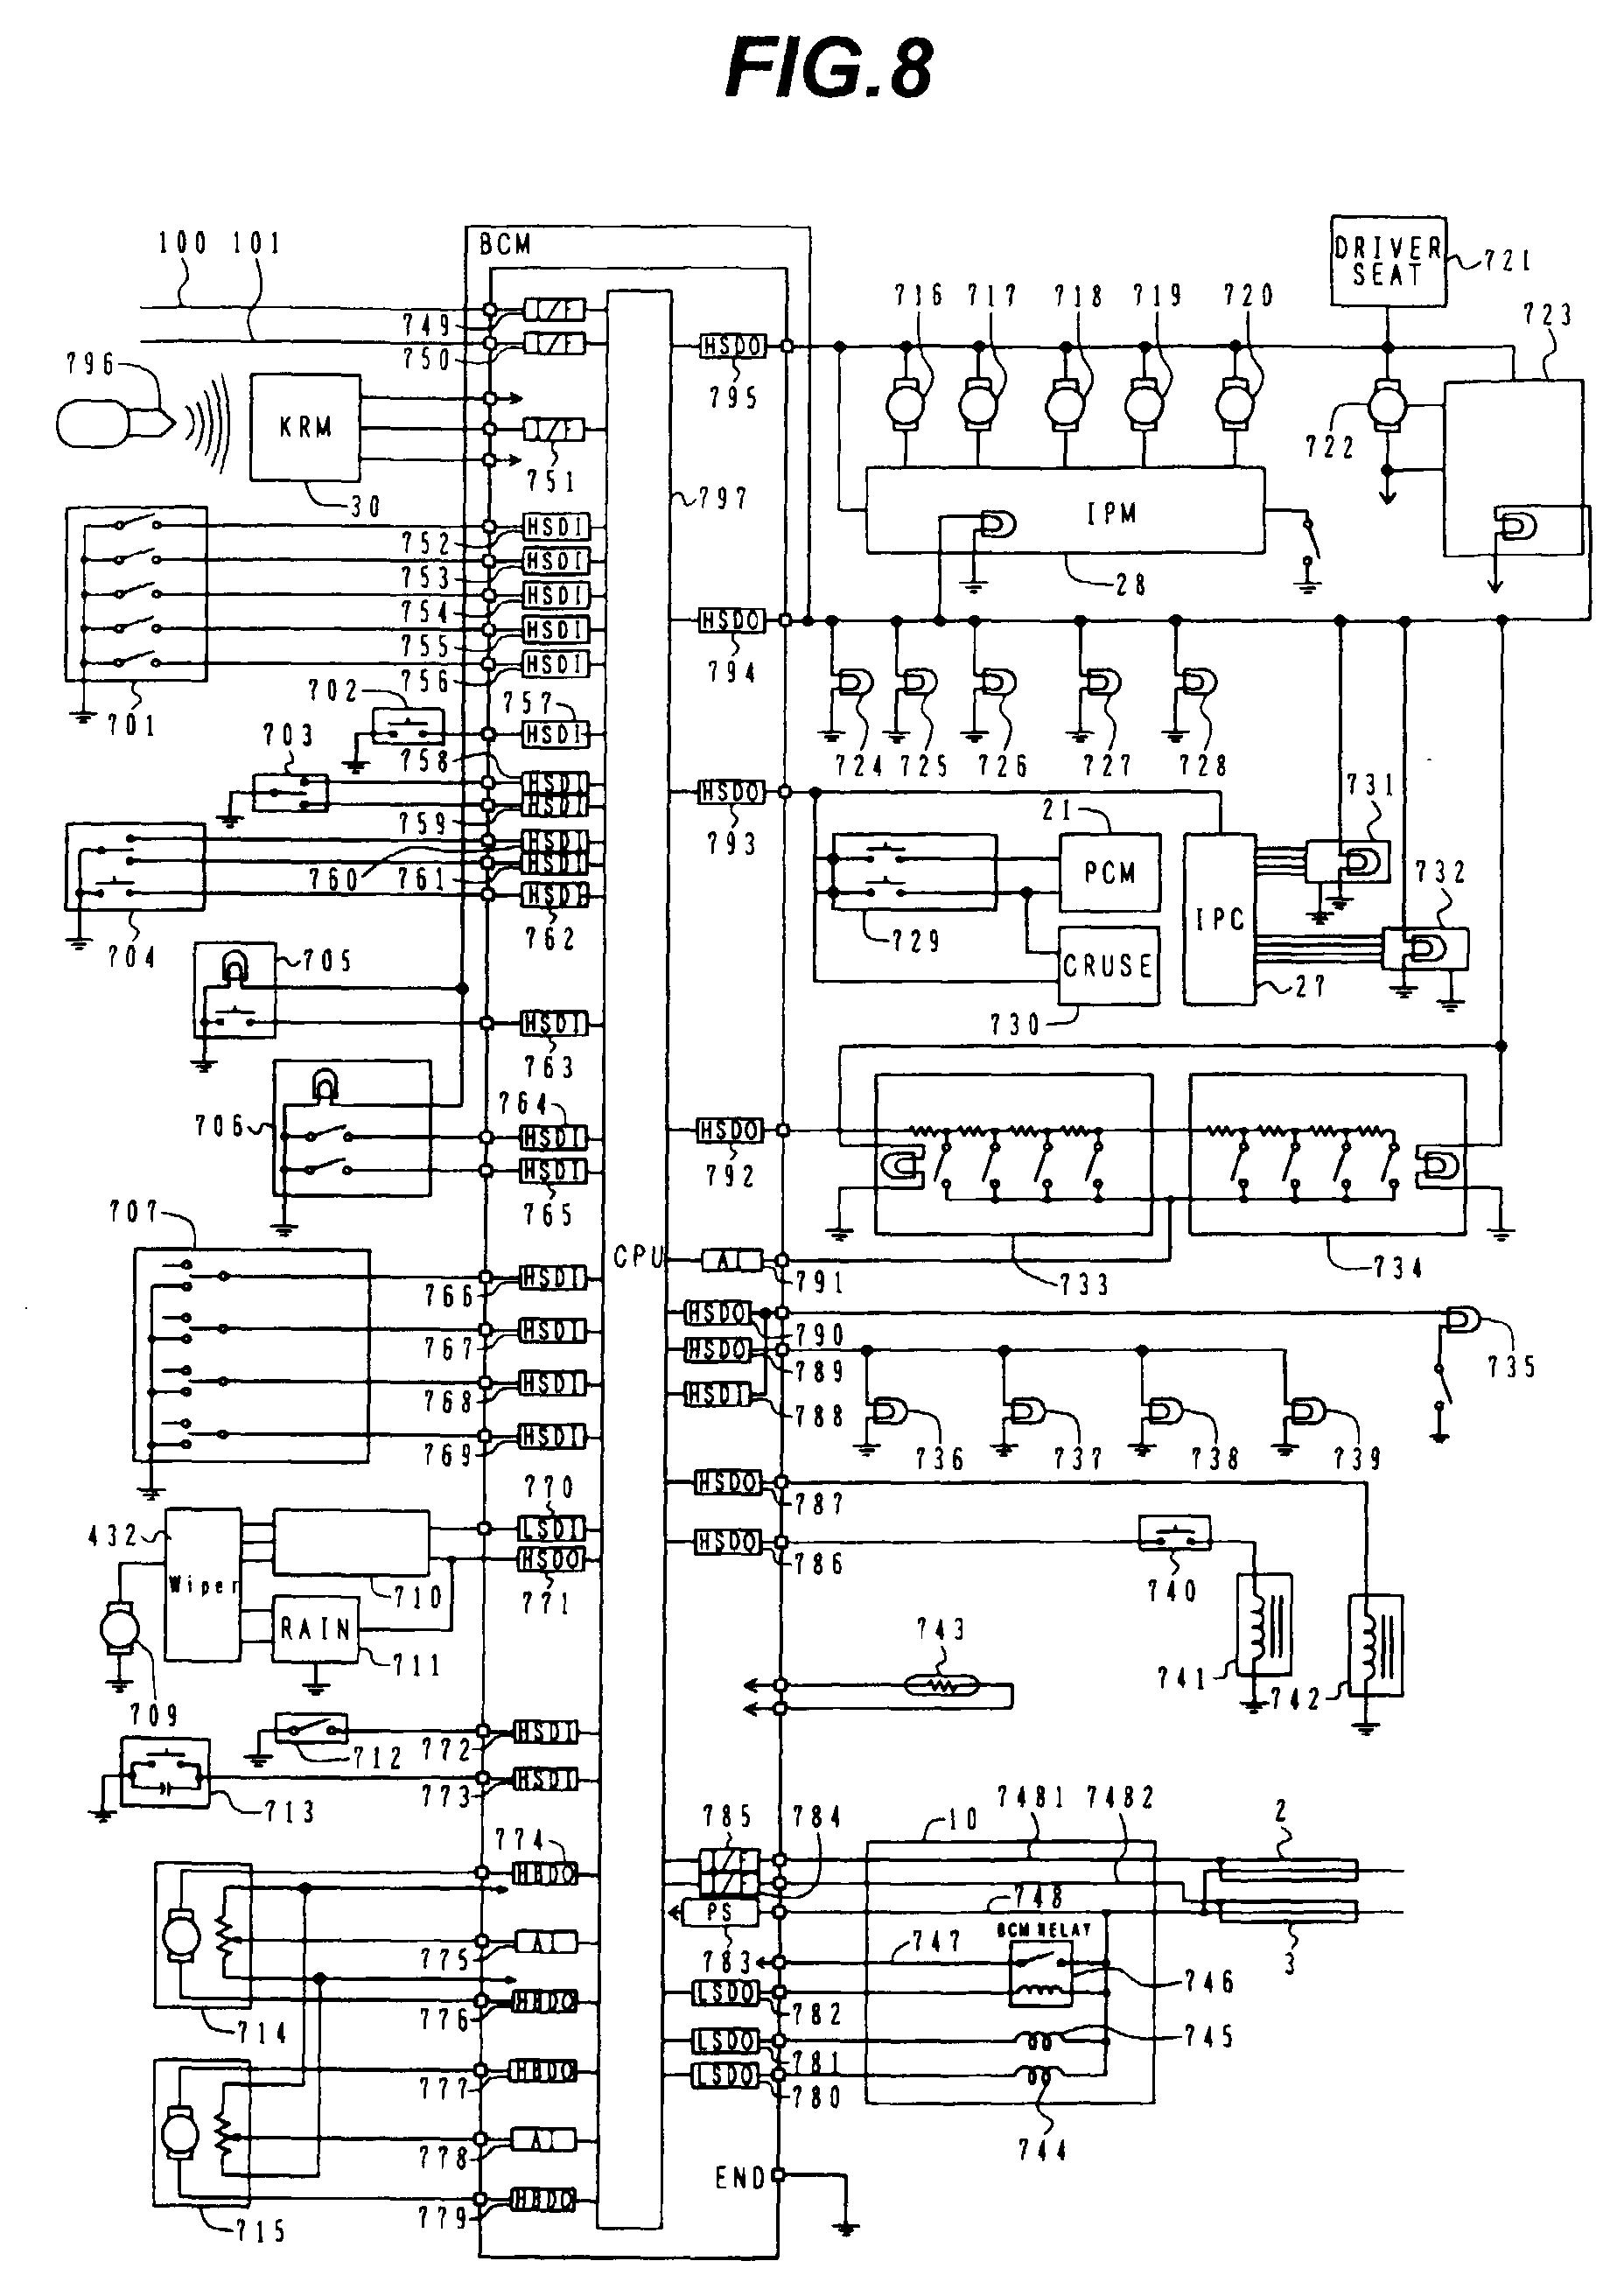 hight resolution of international 9200 wiring diagram wiring diagram third level 1996 international 2674 wiring diagram 2008 international 9200i wiring diagram